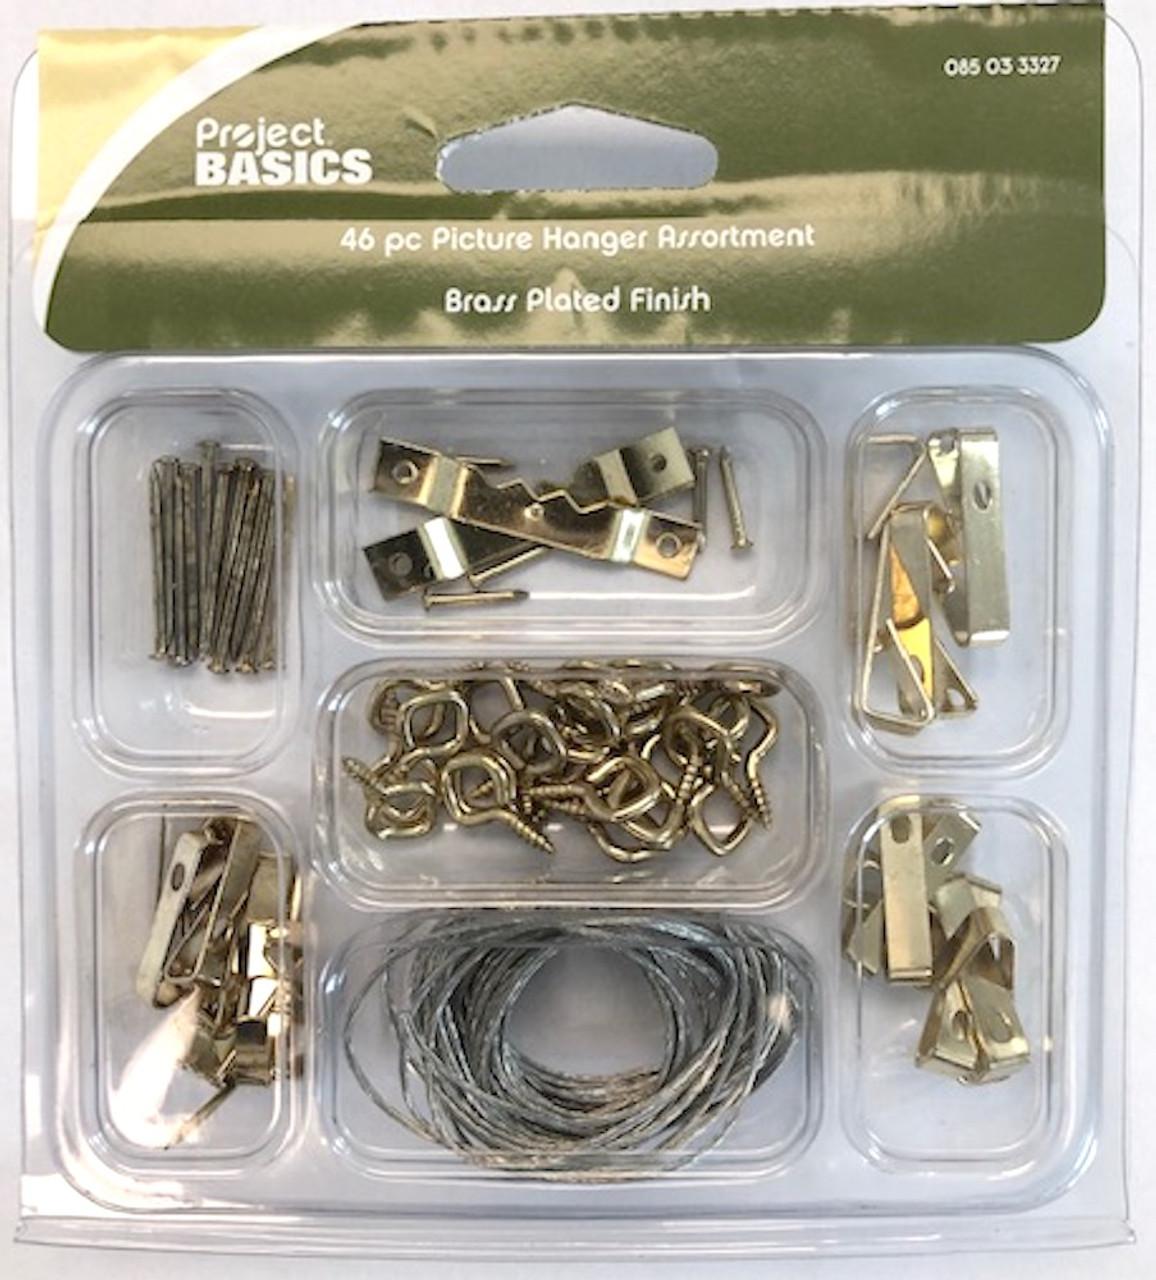 Project Basics 085-03-3327 46 Piece Brass Plated Light & Medium Duty Picture Hanger Kit